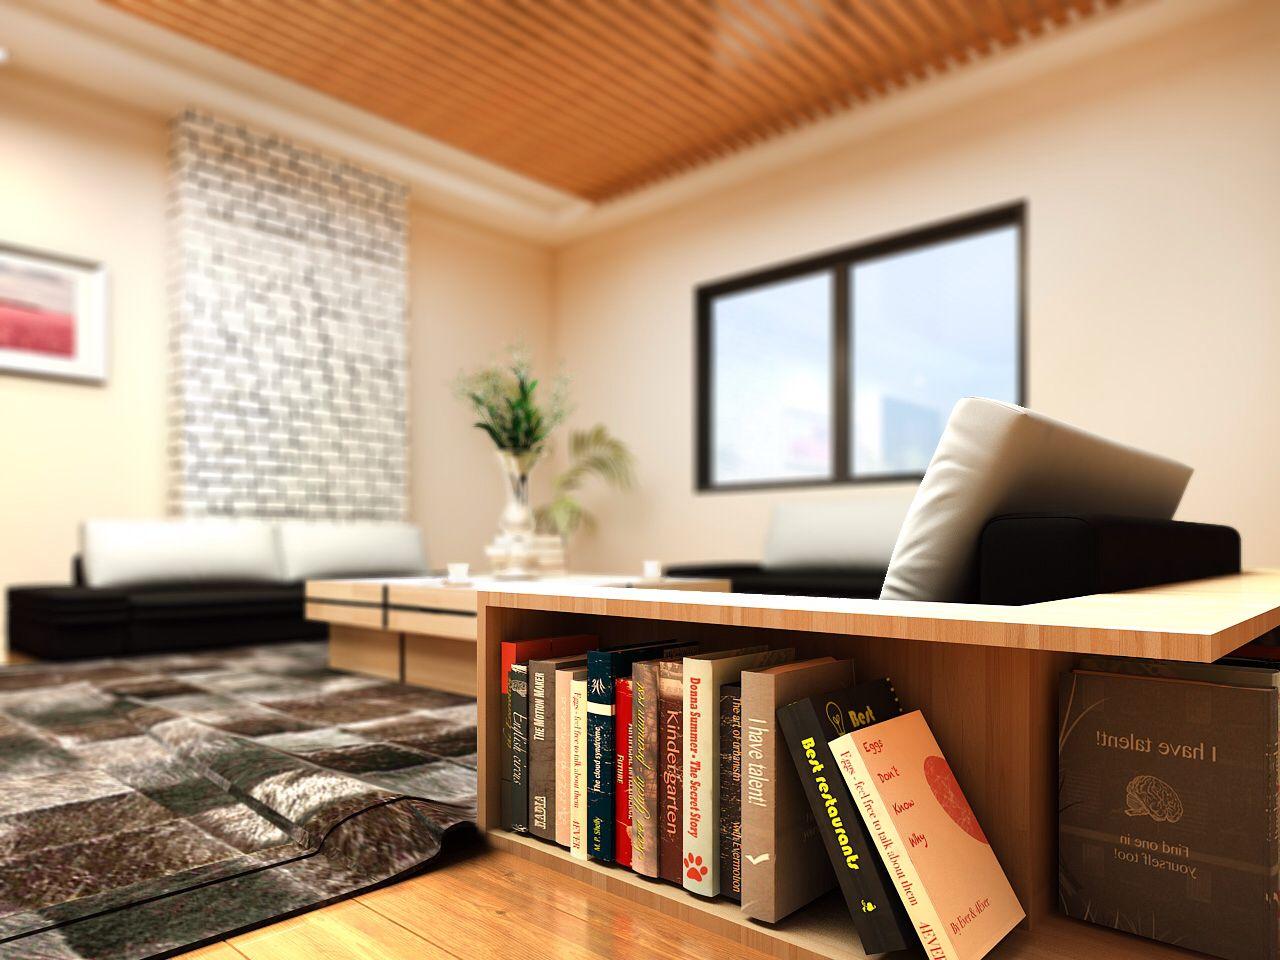 Architecture building architexture buildings design art arts interior